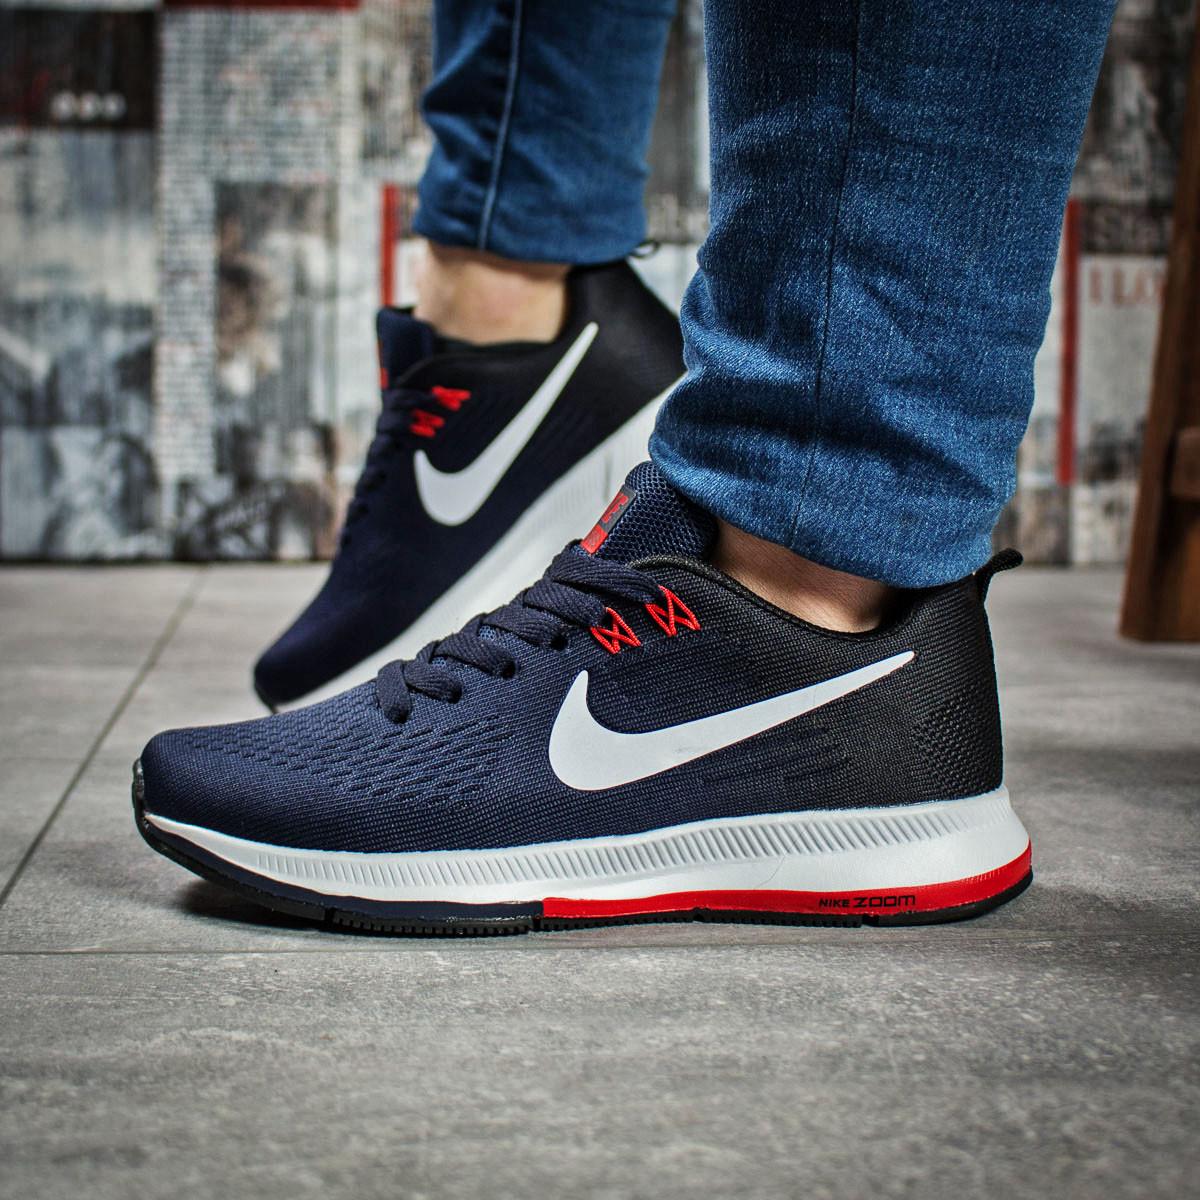 Кроссовки женские 16033, Nike Zoom Pegasus, темно-синие, < 39 > р. 39-24,5см.